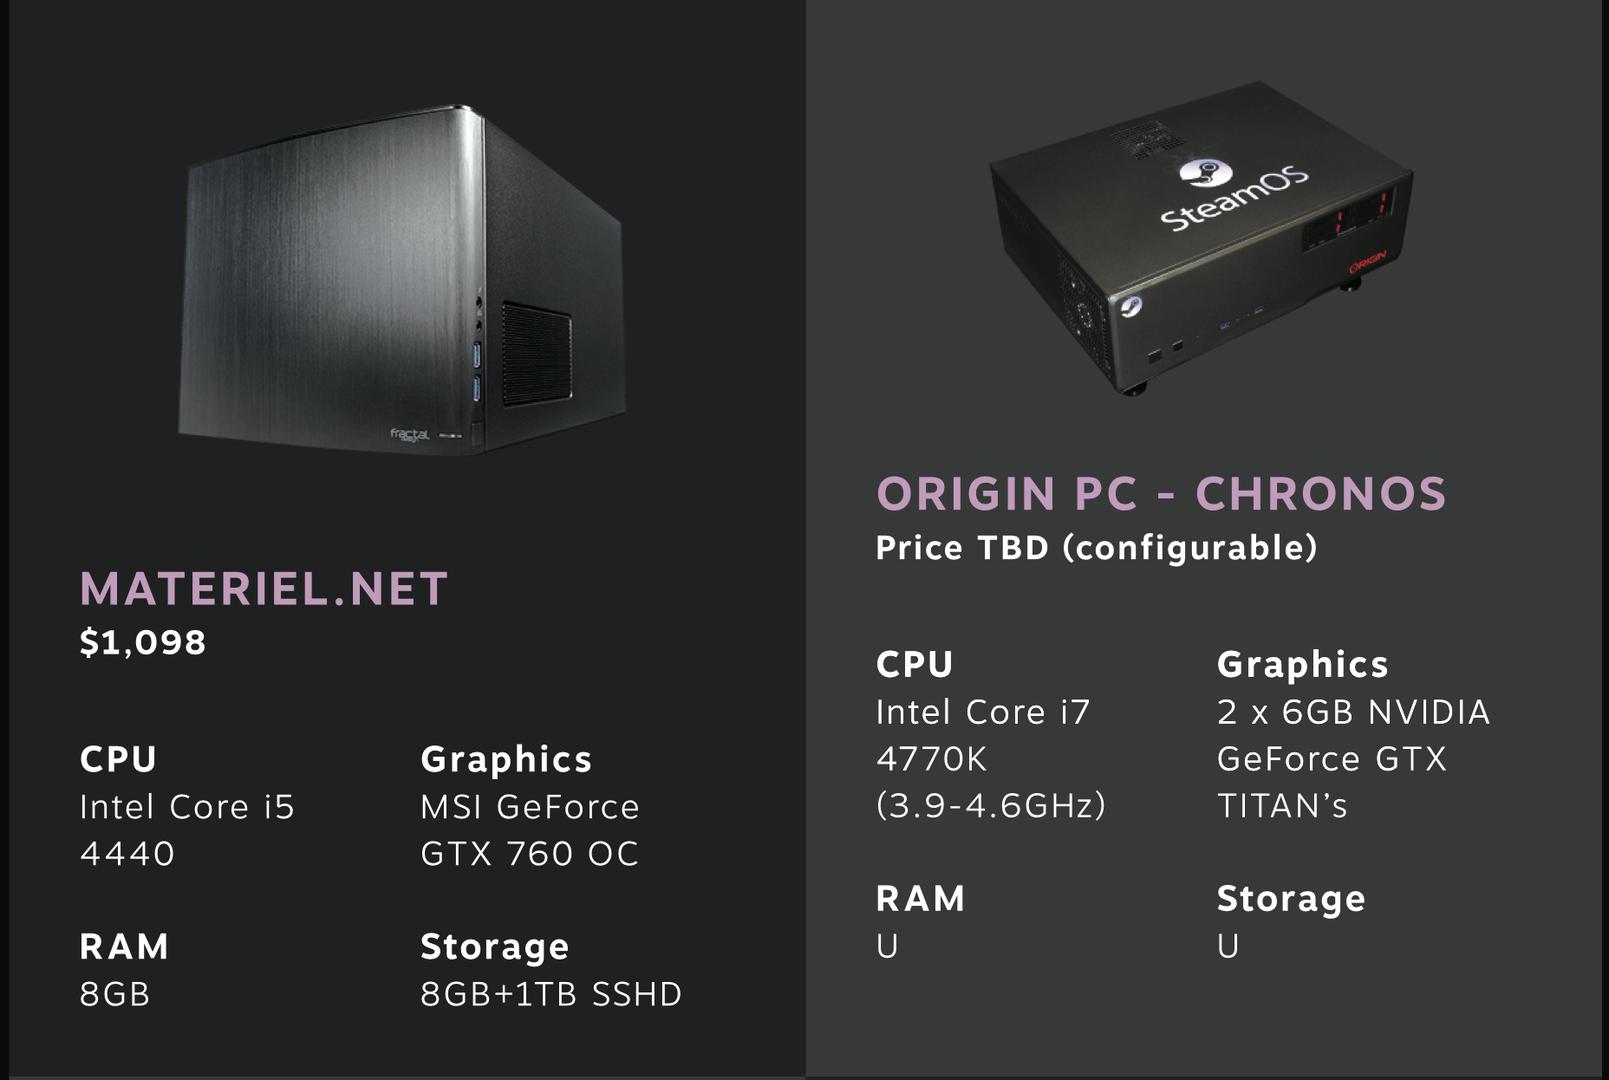 Materiel.net und Origin PC